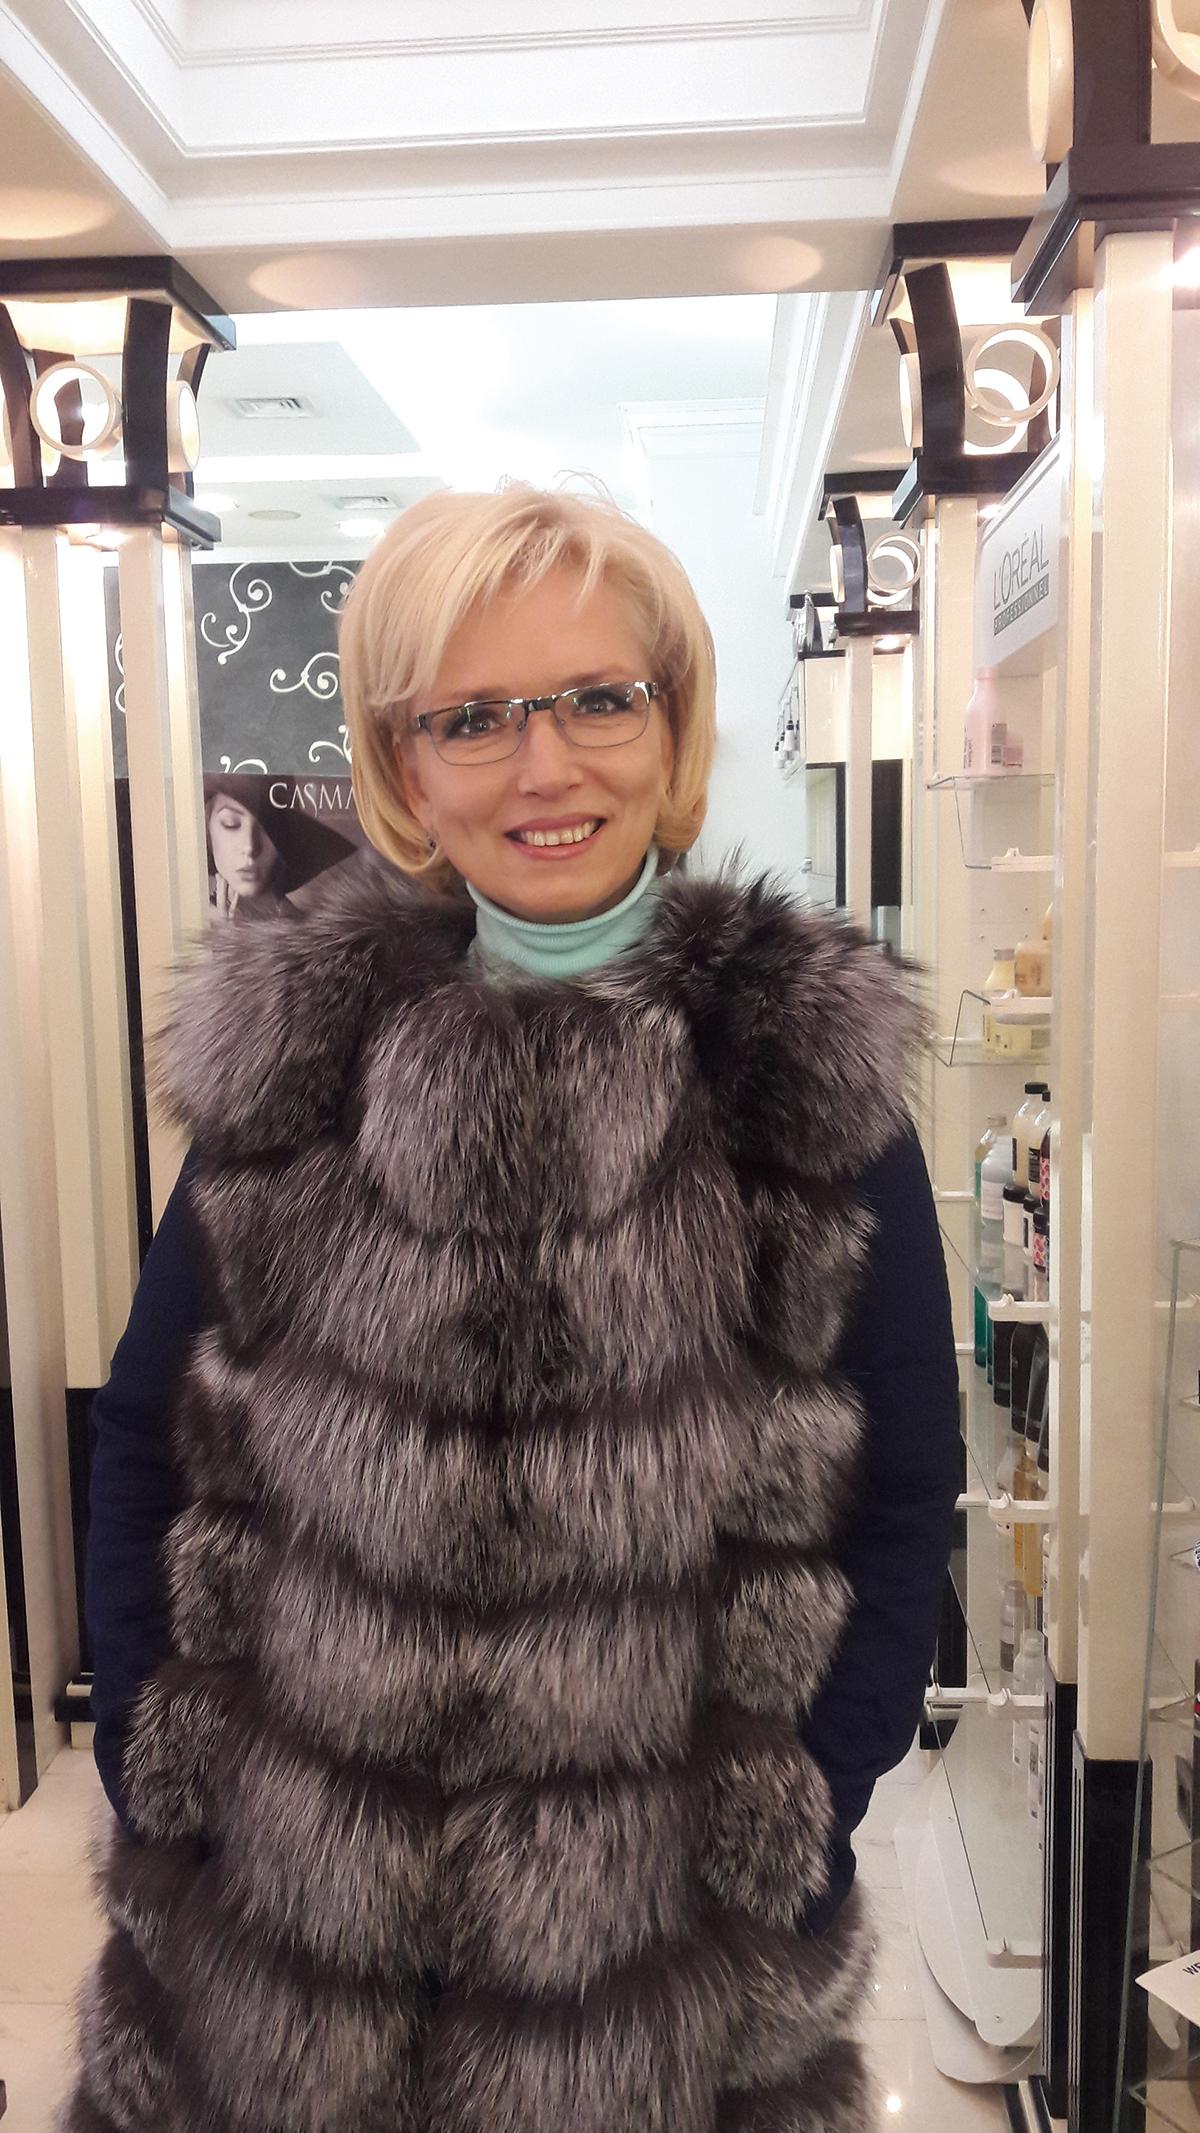 Даценко Людмила Миколаївна